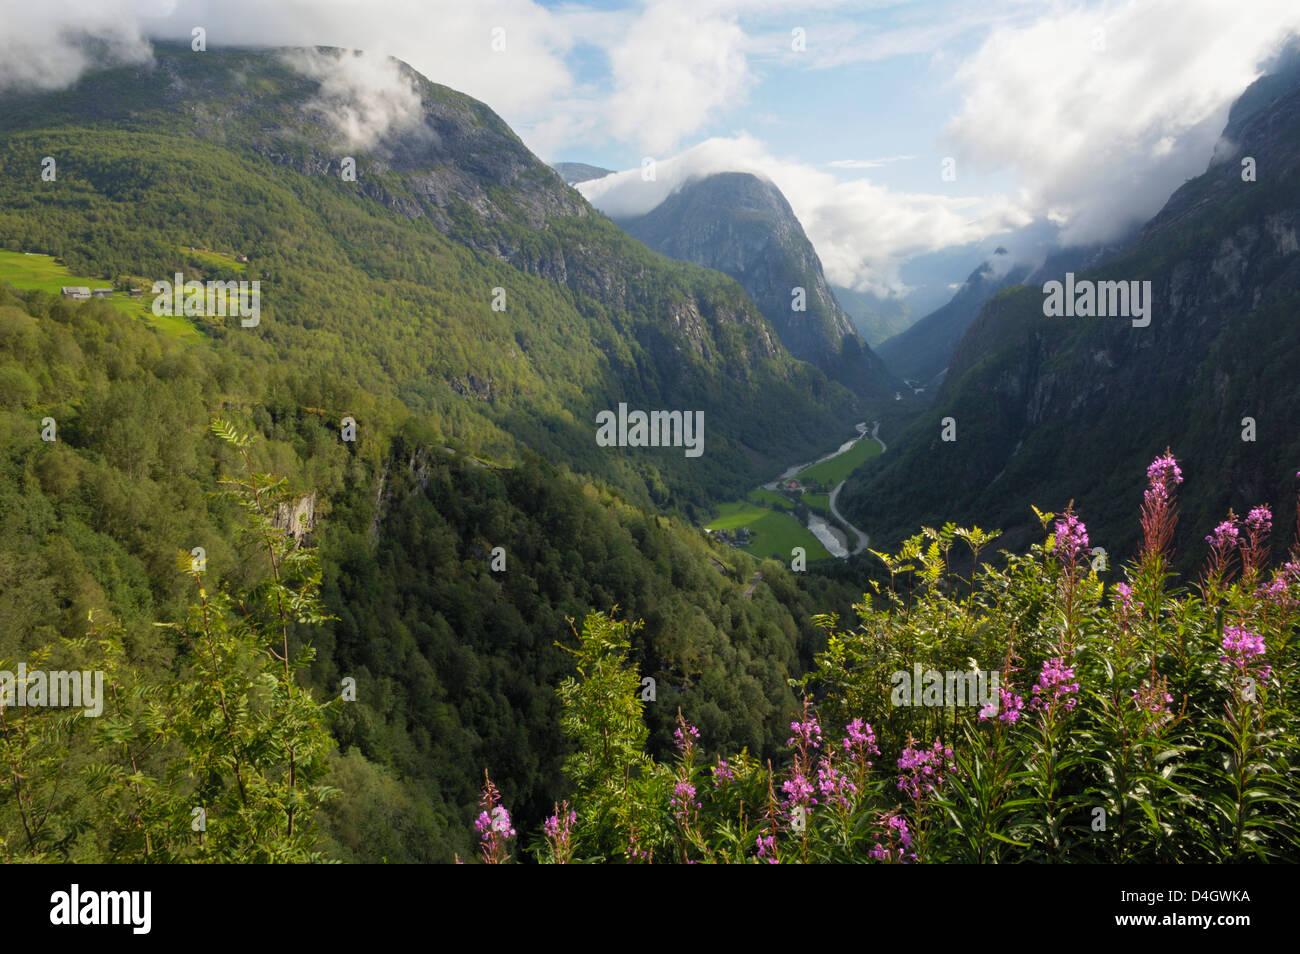 View from Stalheim, Naeroydalen valley, Norway, Scandinavia - Stock Image